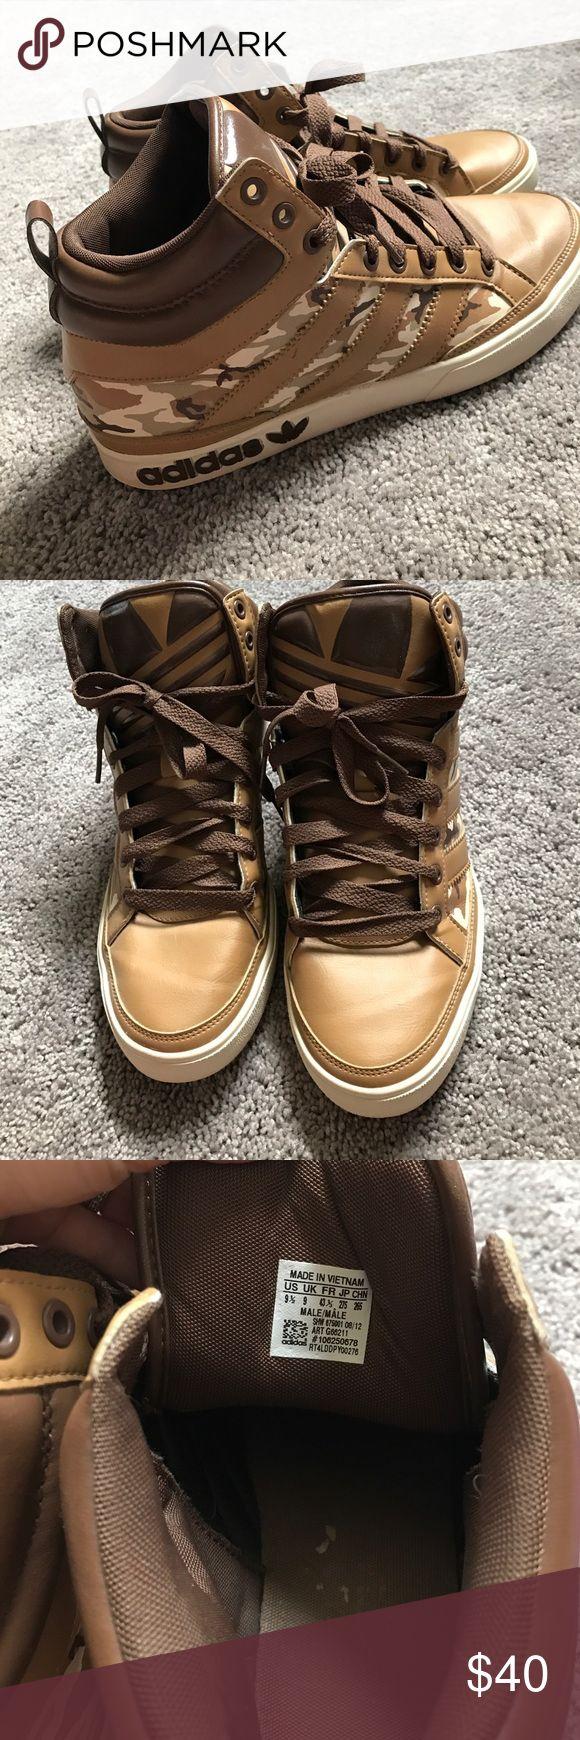 high top Adidas camo sneaker Gently worn. Mens 9.5 Adidas brown camo sneaker Adidas Shoes Sneakers